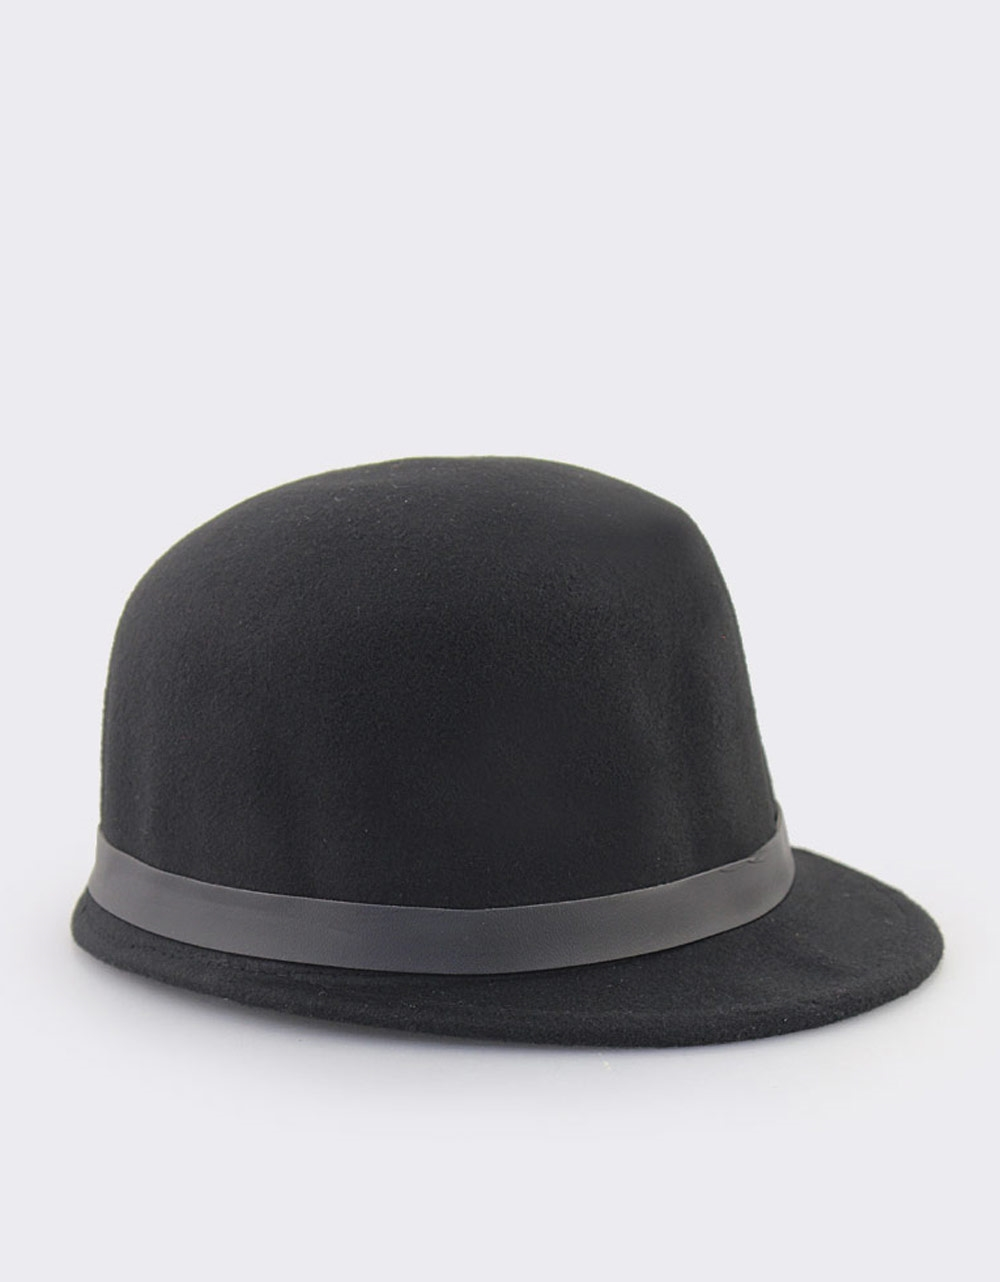 b7a7ca8c54 Εικόνα από Γυναικεια καπέλα με διακοσμητικό λουράκι Μαύρο